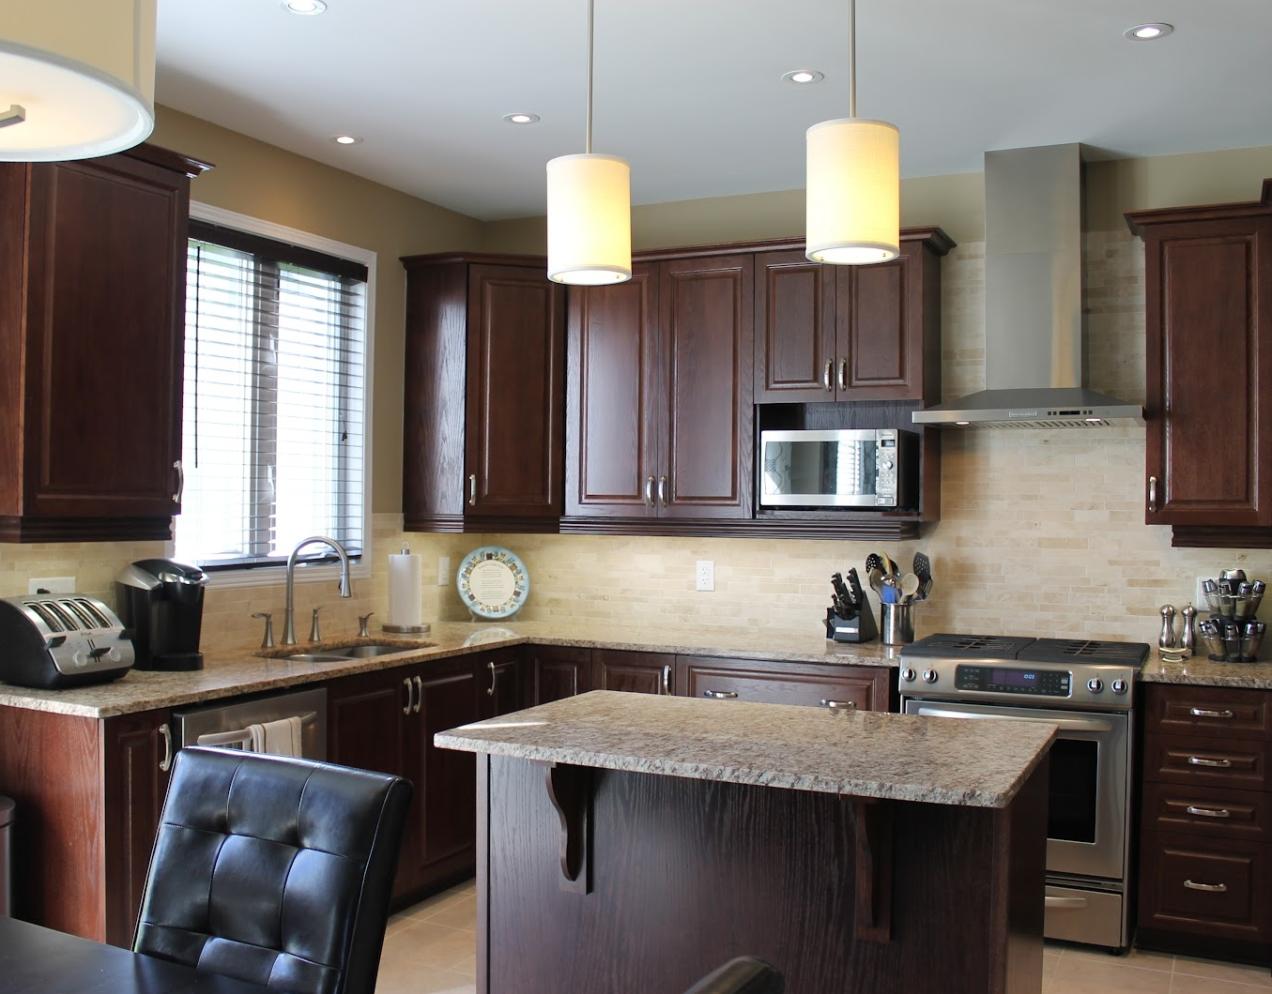 Chocolate Color Raised Solid Wood Door Design Kitchen Cabinets - Buy Solid  Wood Kitchen Cabinets,Raised Door Kitchen Cabinet,Design Kitchen Cabinets  ...